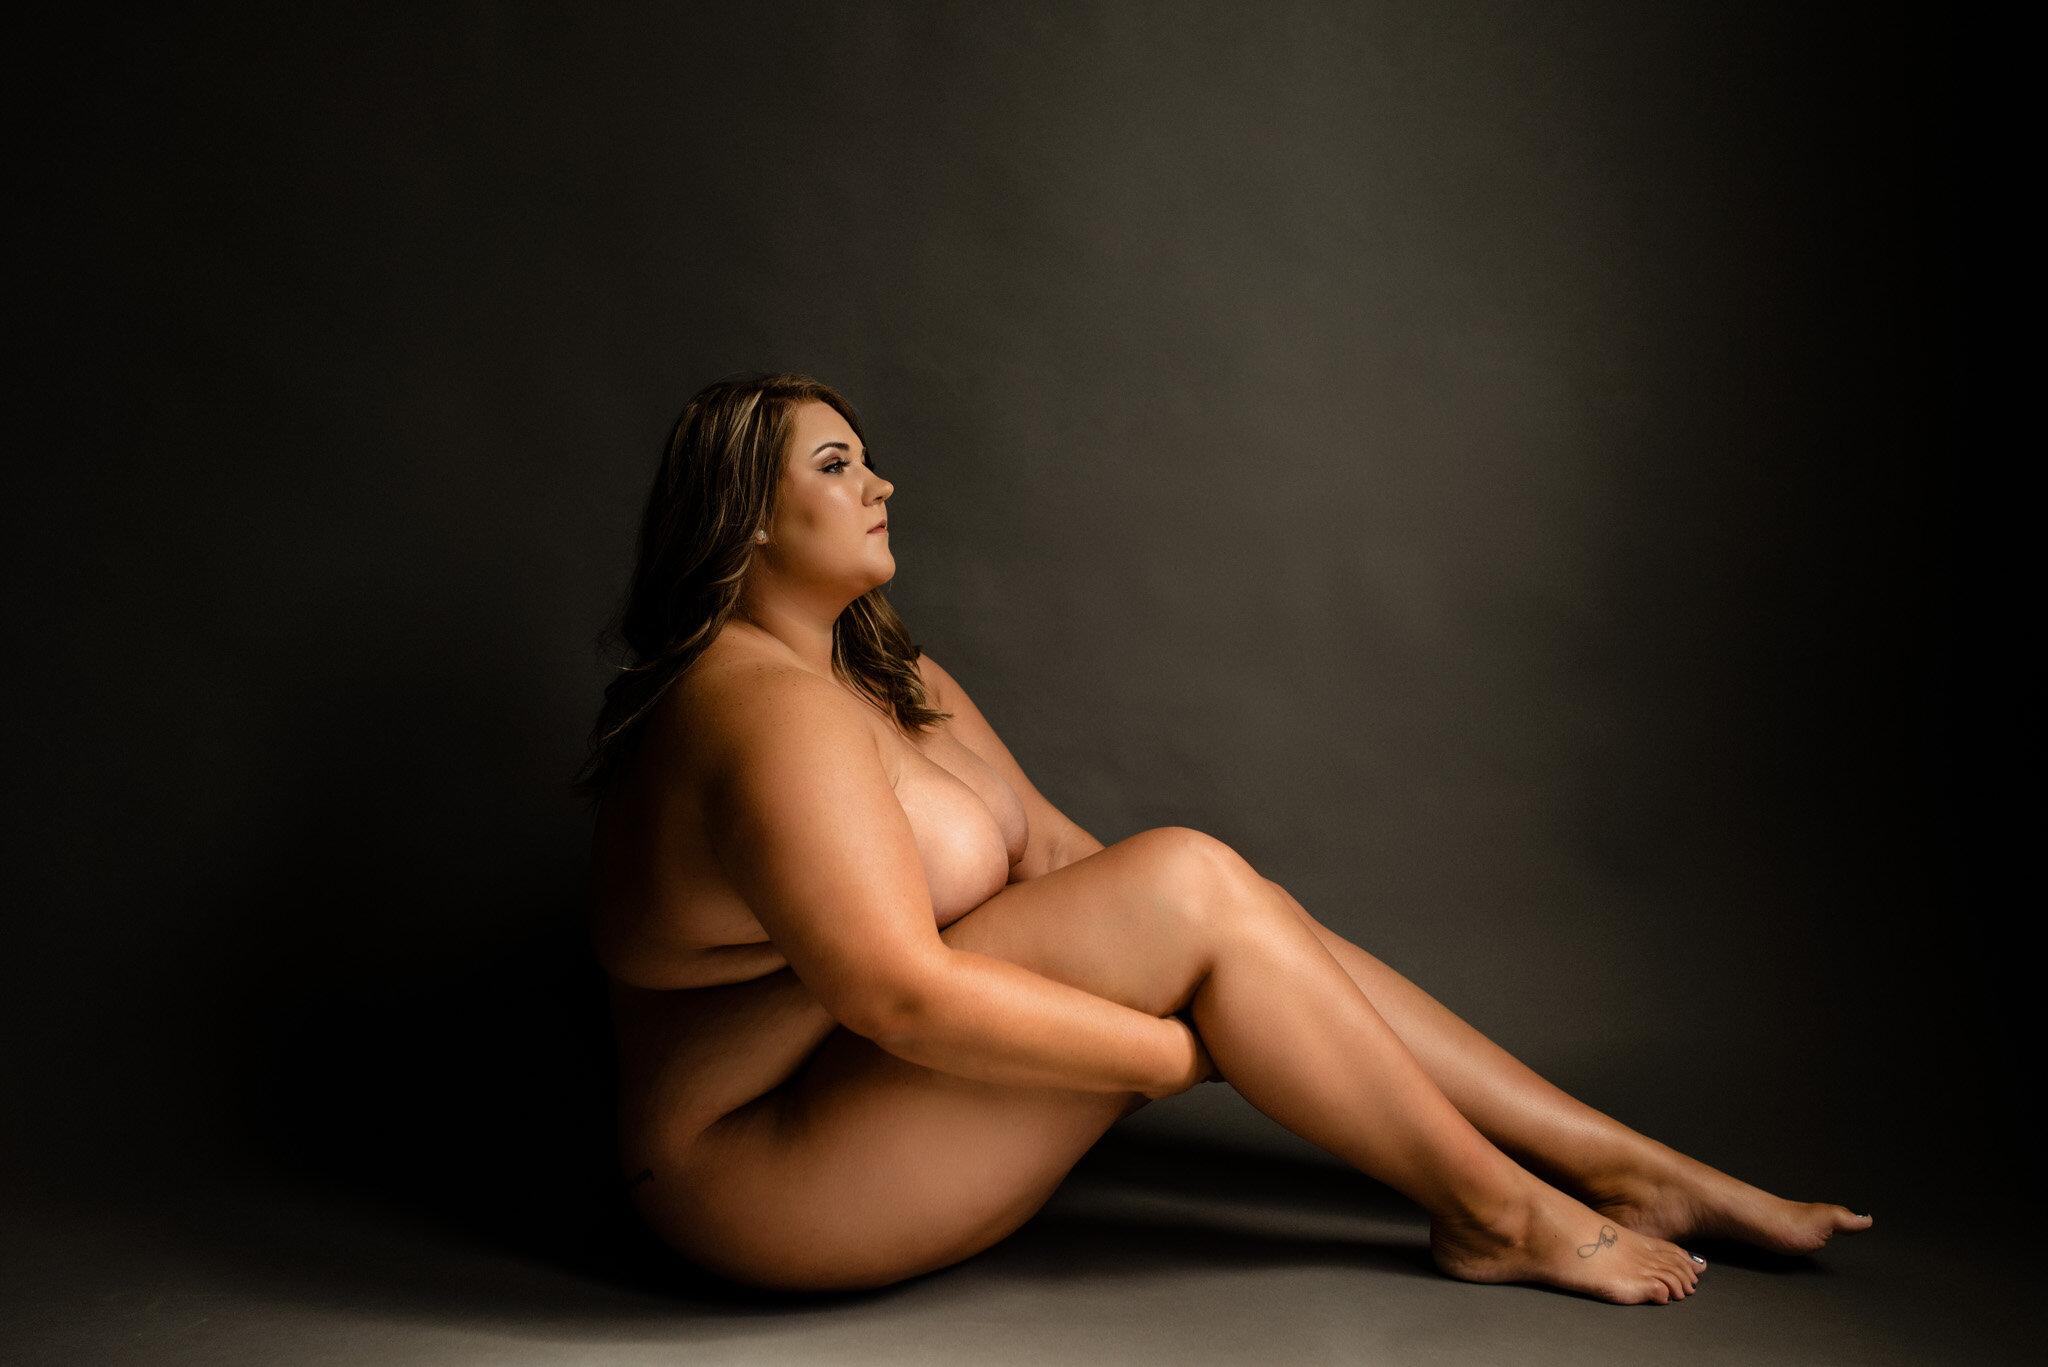 nashville-boudoir-curvy-model-13.jpg